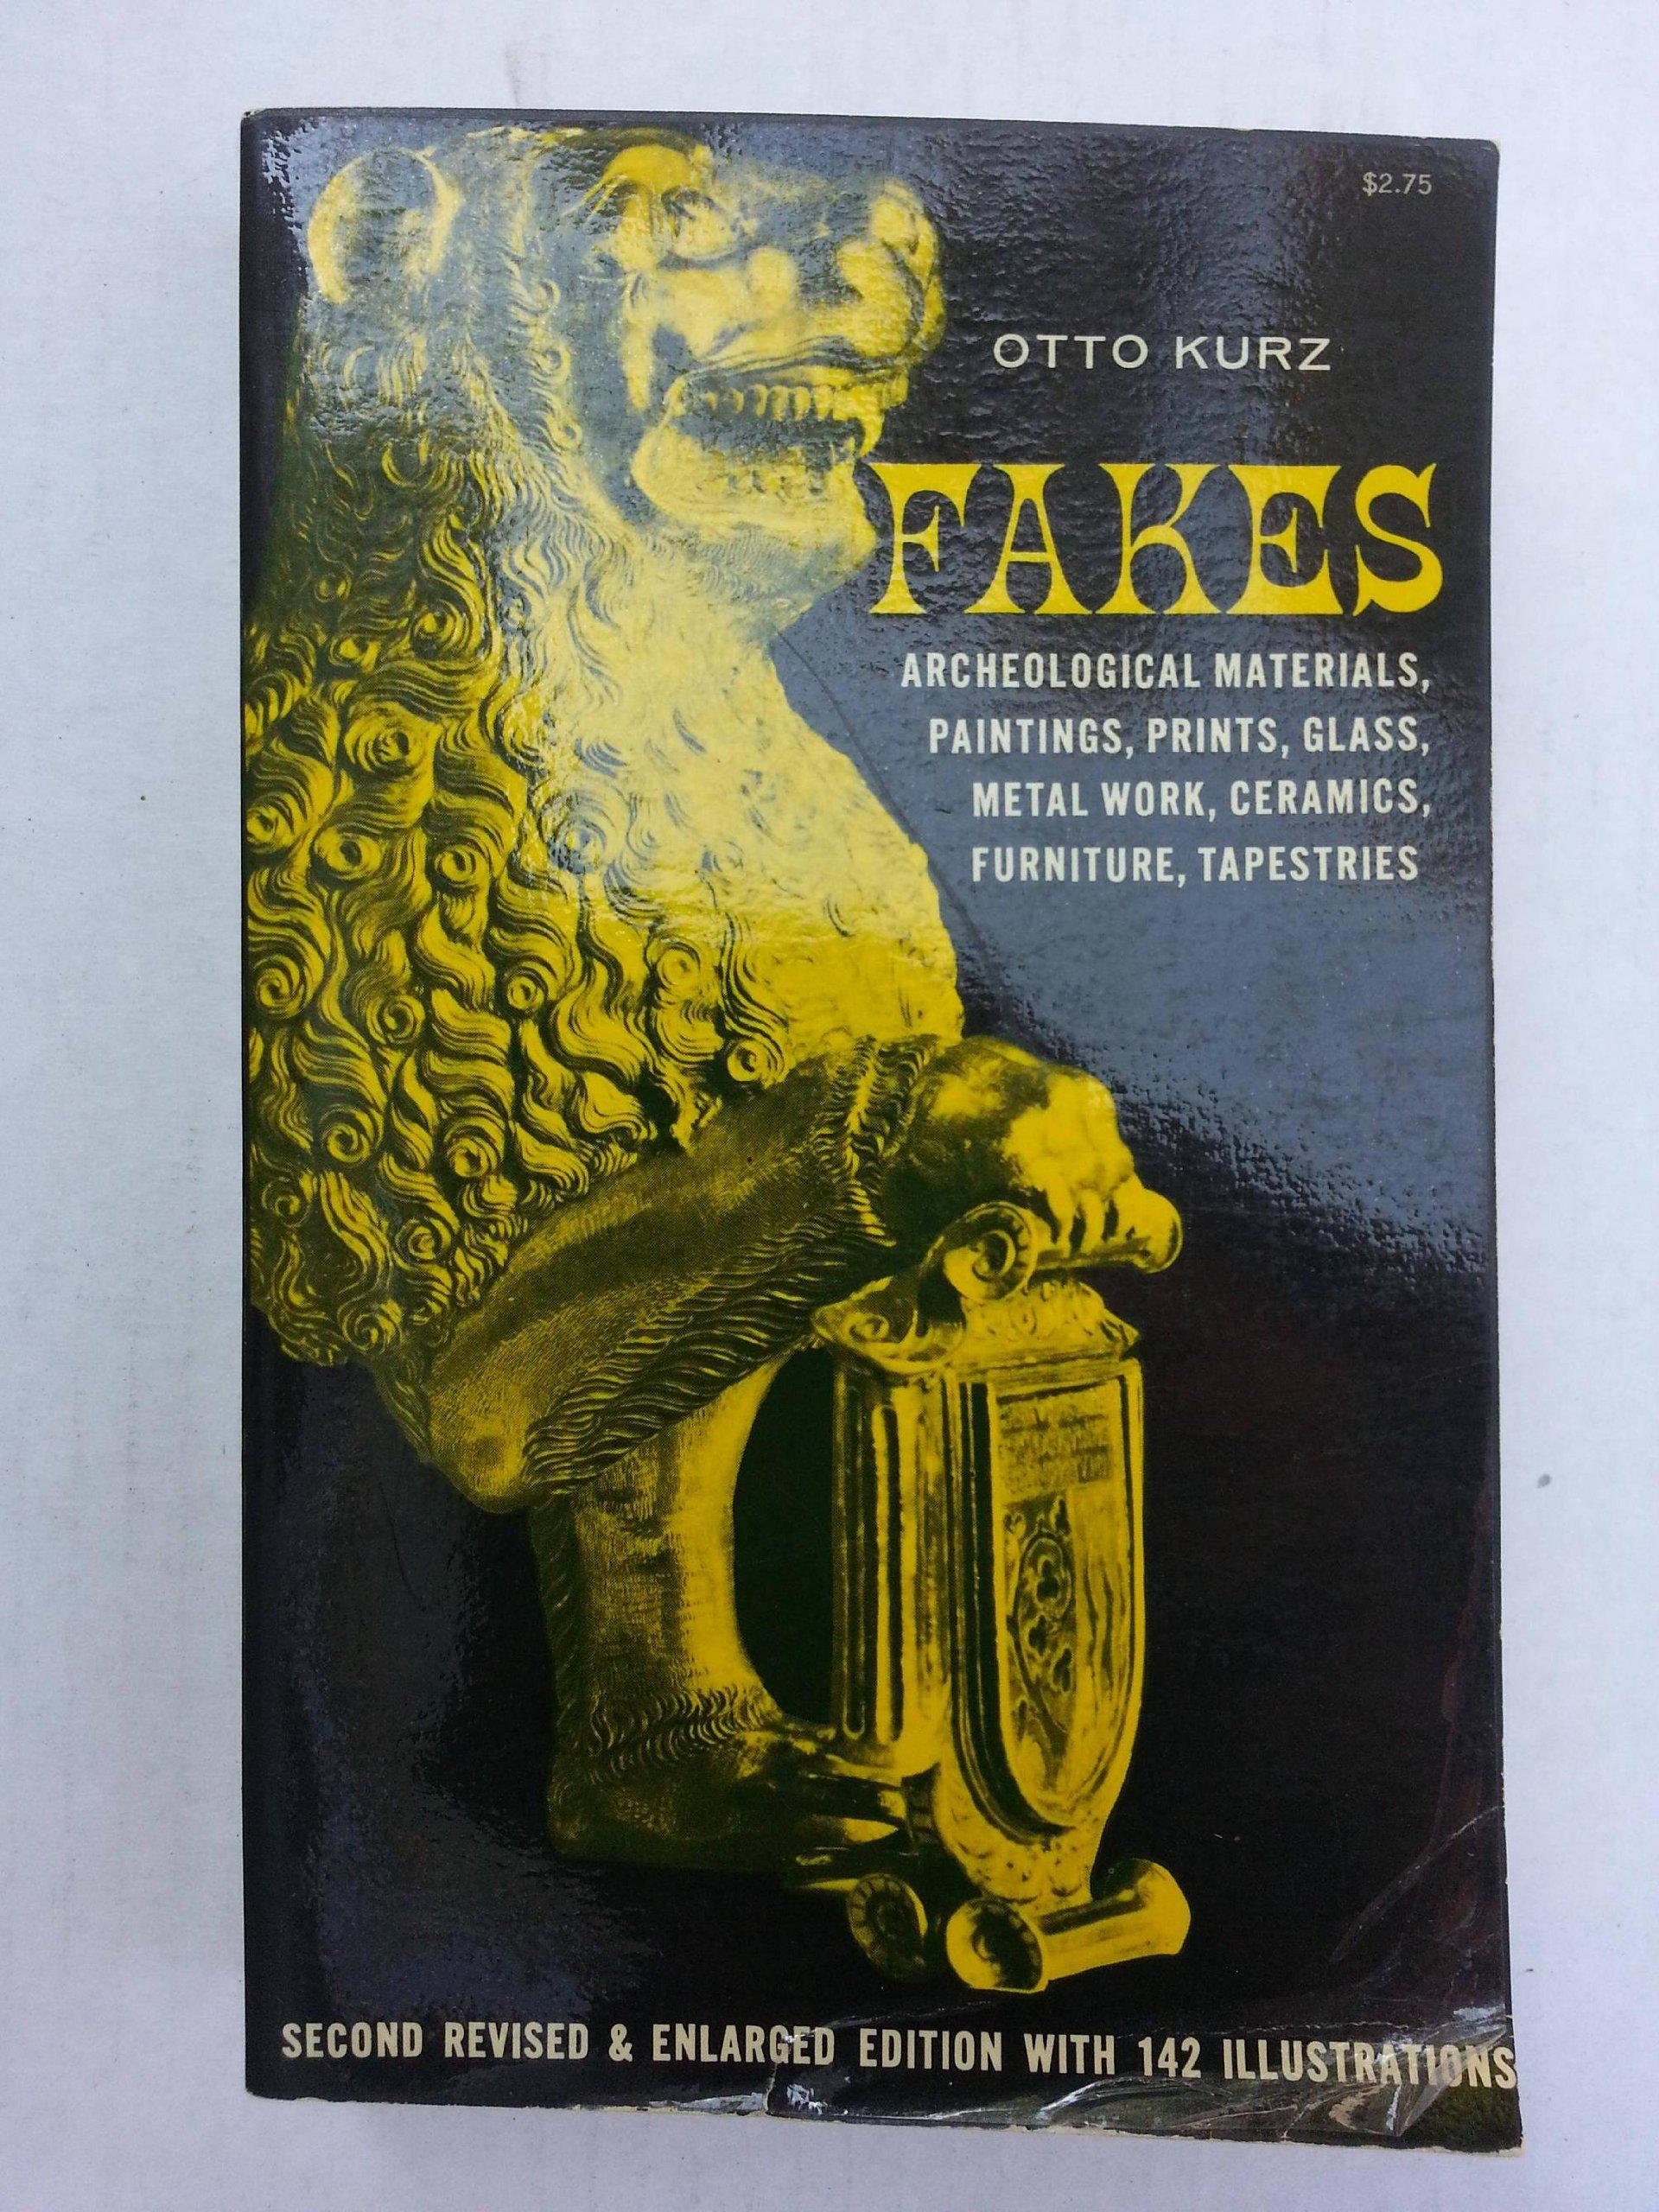 Fakes: Archeological Materials, Paintings, Prints, Glass, Metal Work, Ceramics, Furniture, Tapestries